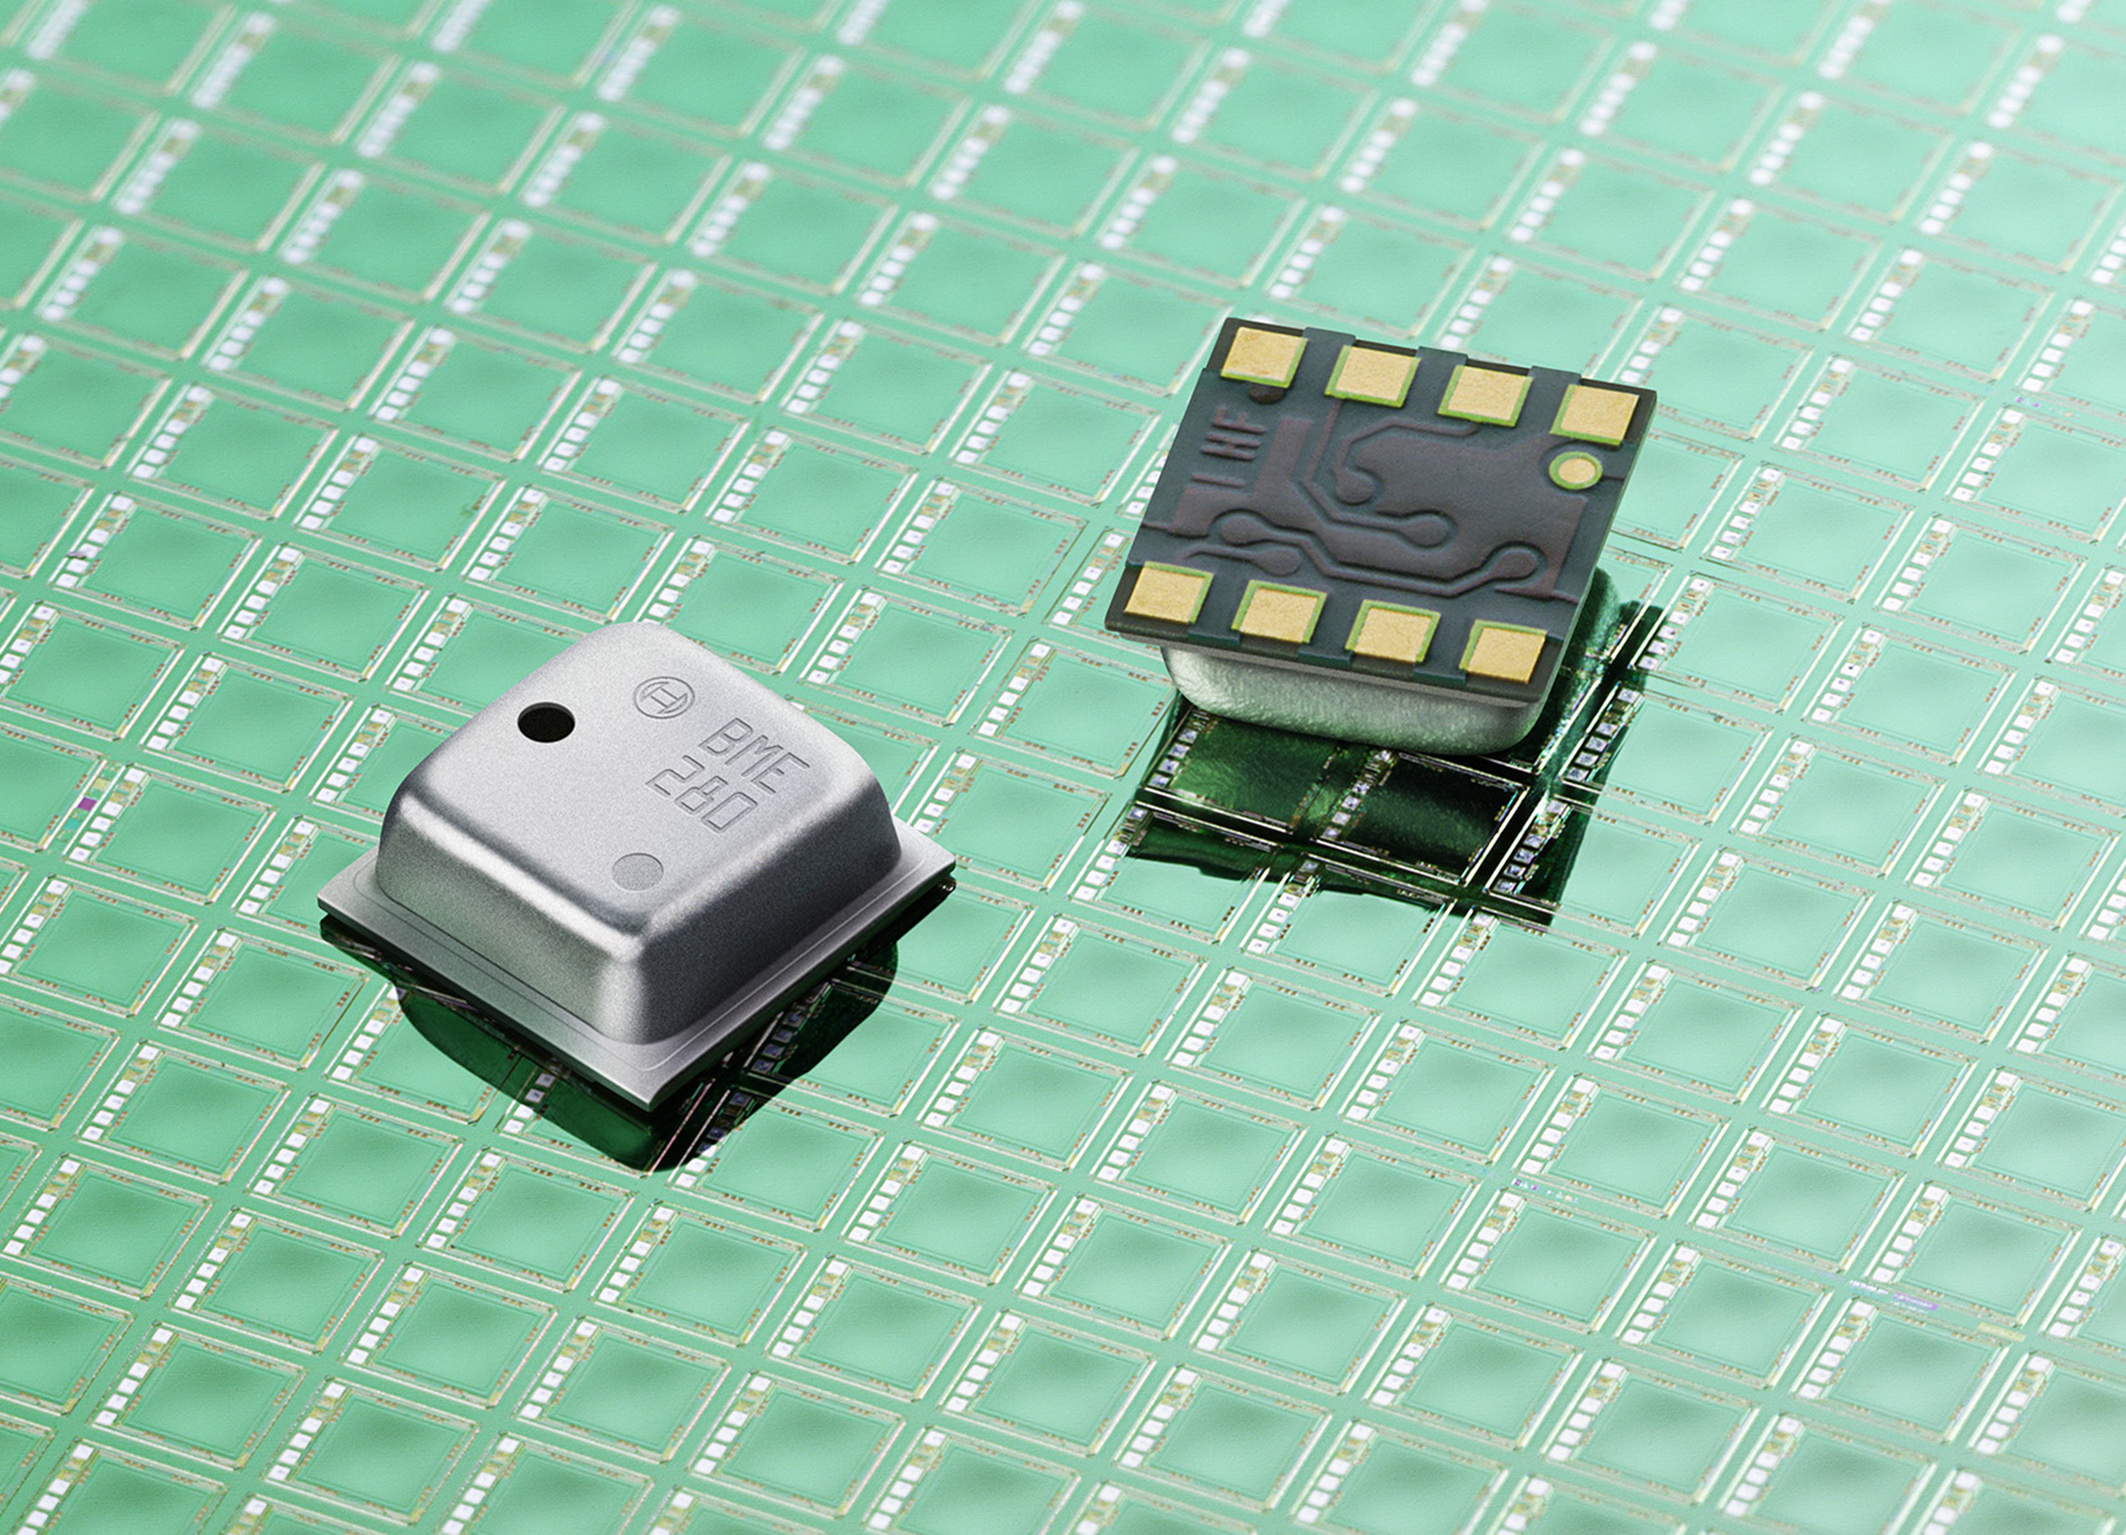 ConsumerElectronics senzor MEMS BME280